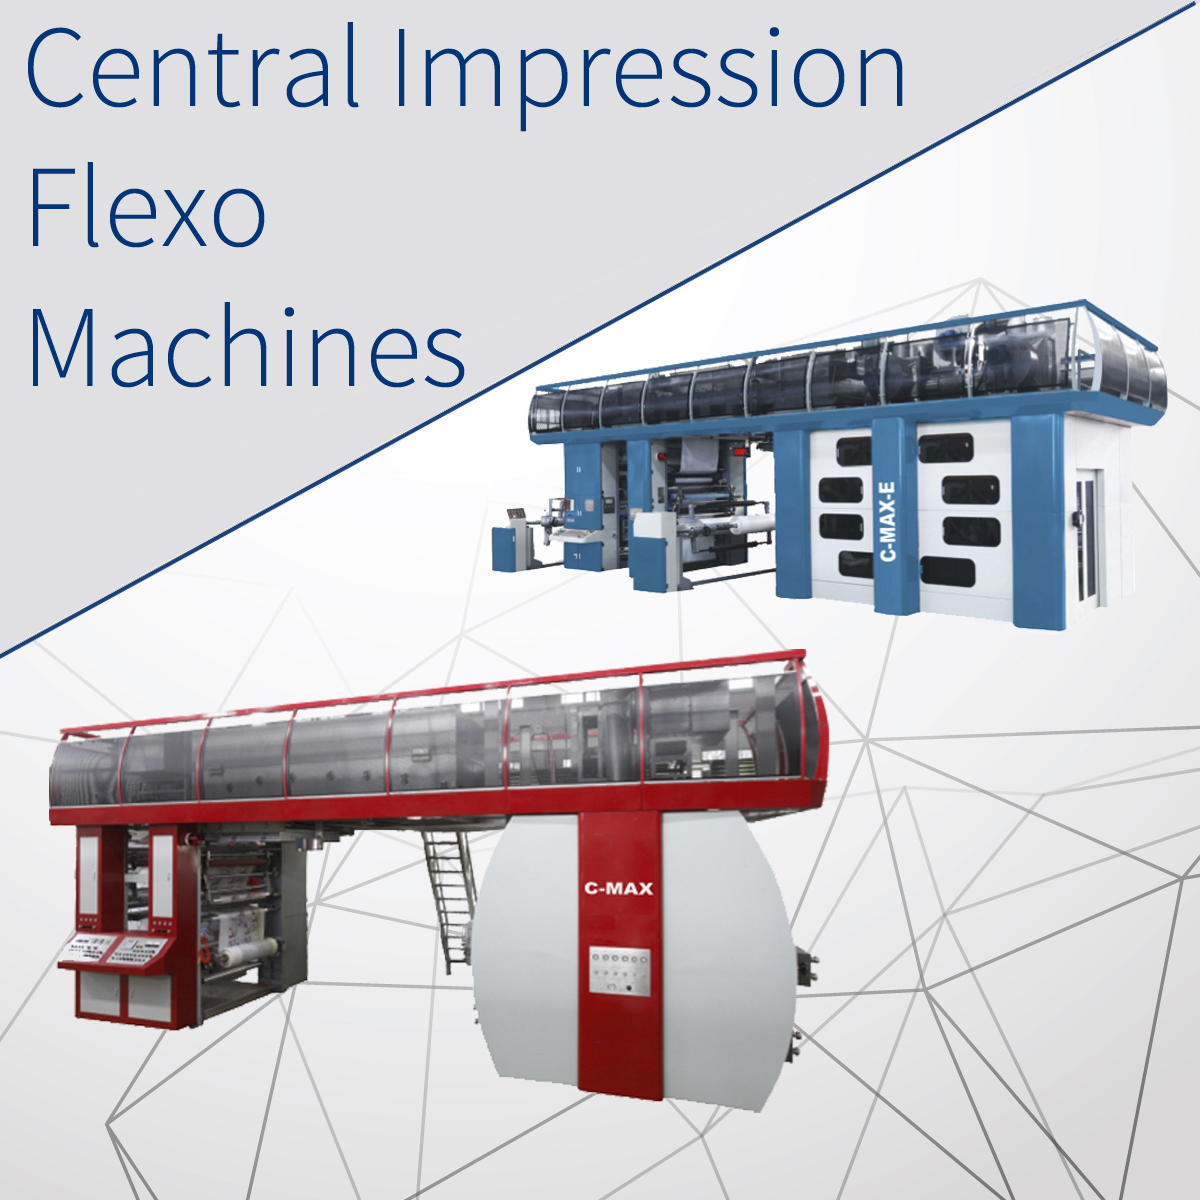 Central Impression Flexo Machines 2.jpg